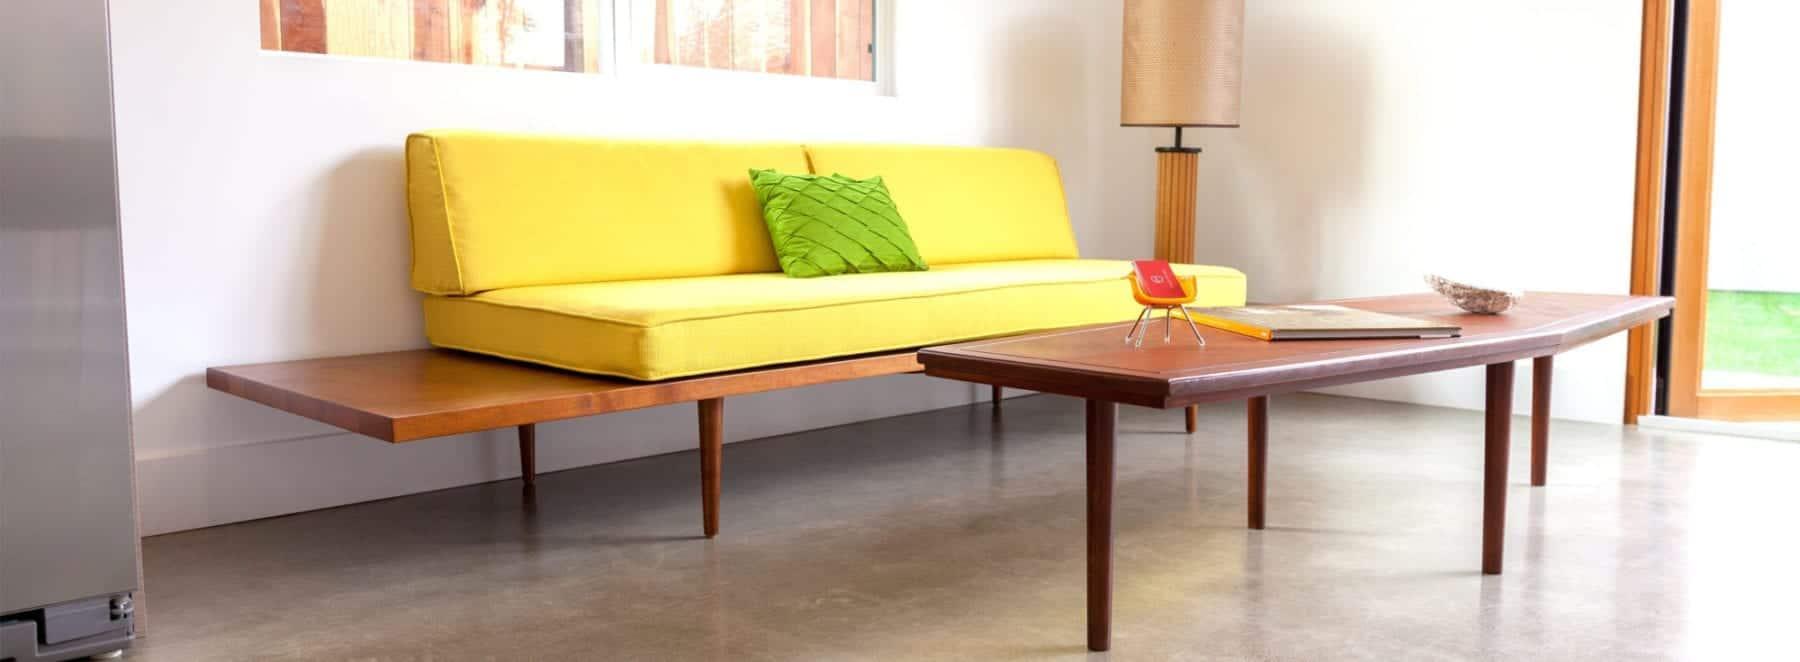 Mid Century Modern Sofa Simple Elegant Classy